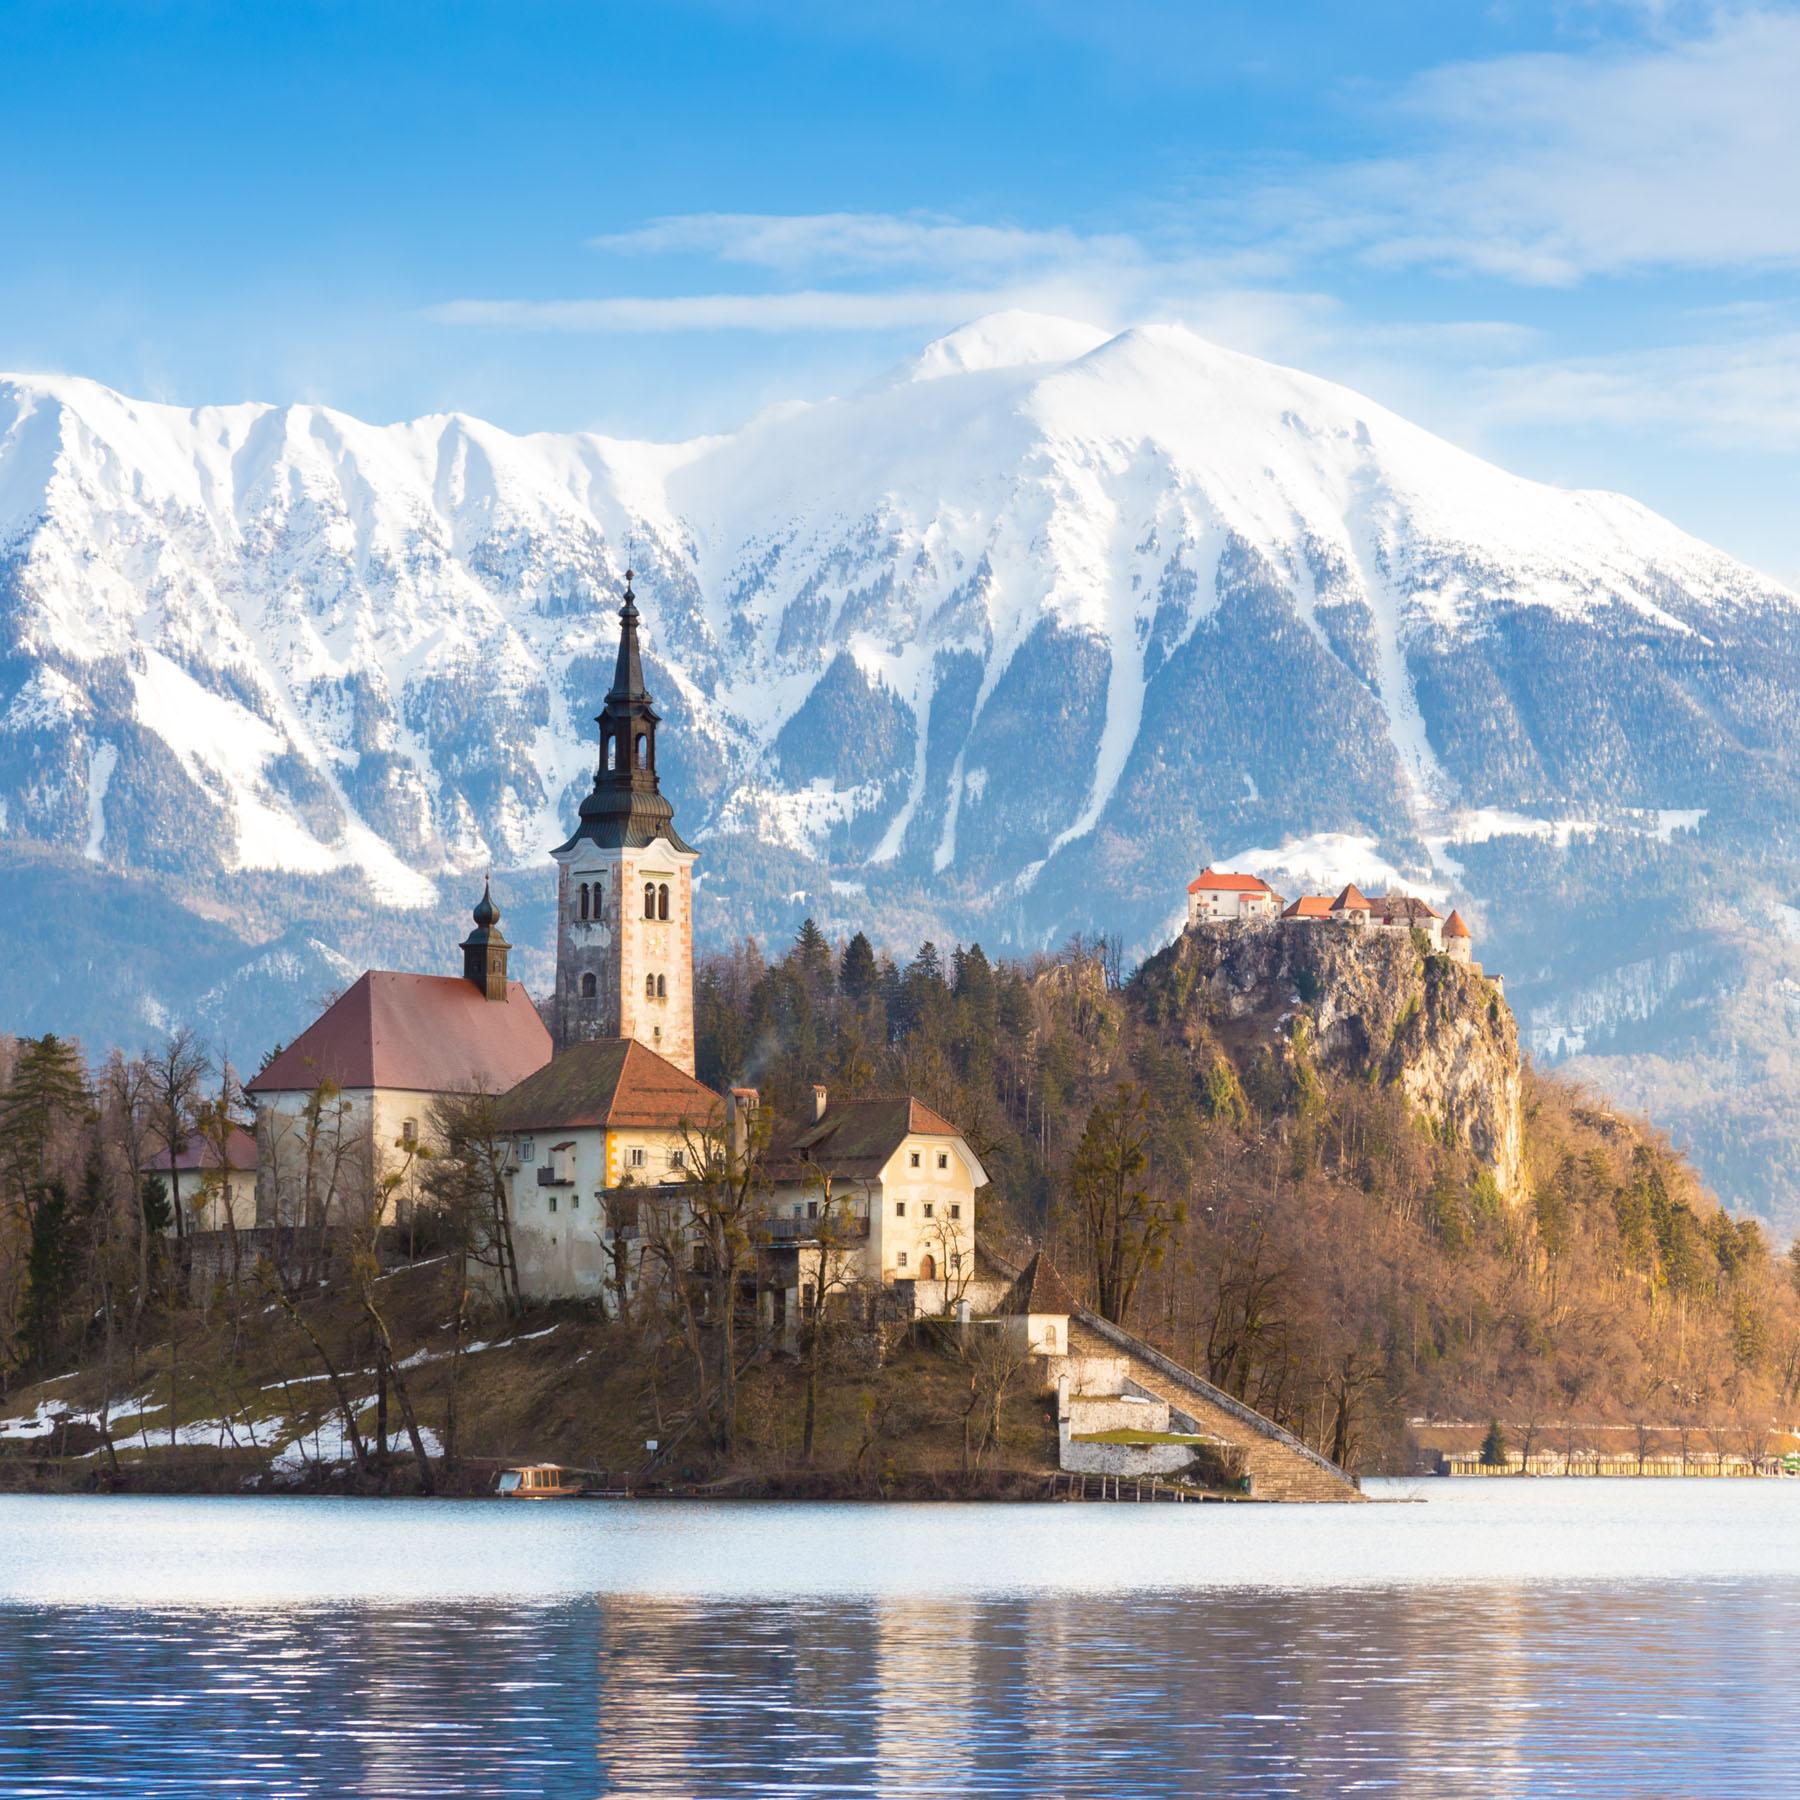 Slovenia-Bled Lake_182895872 (1)